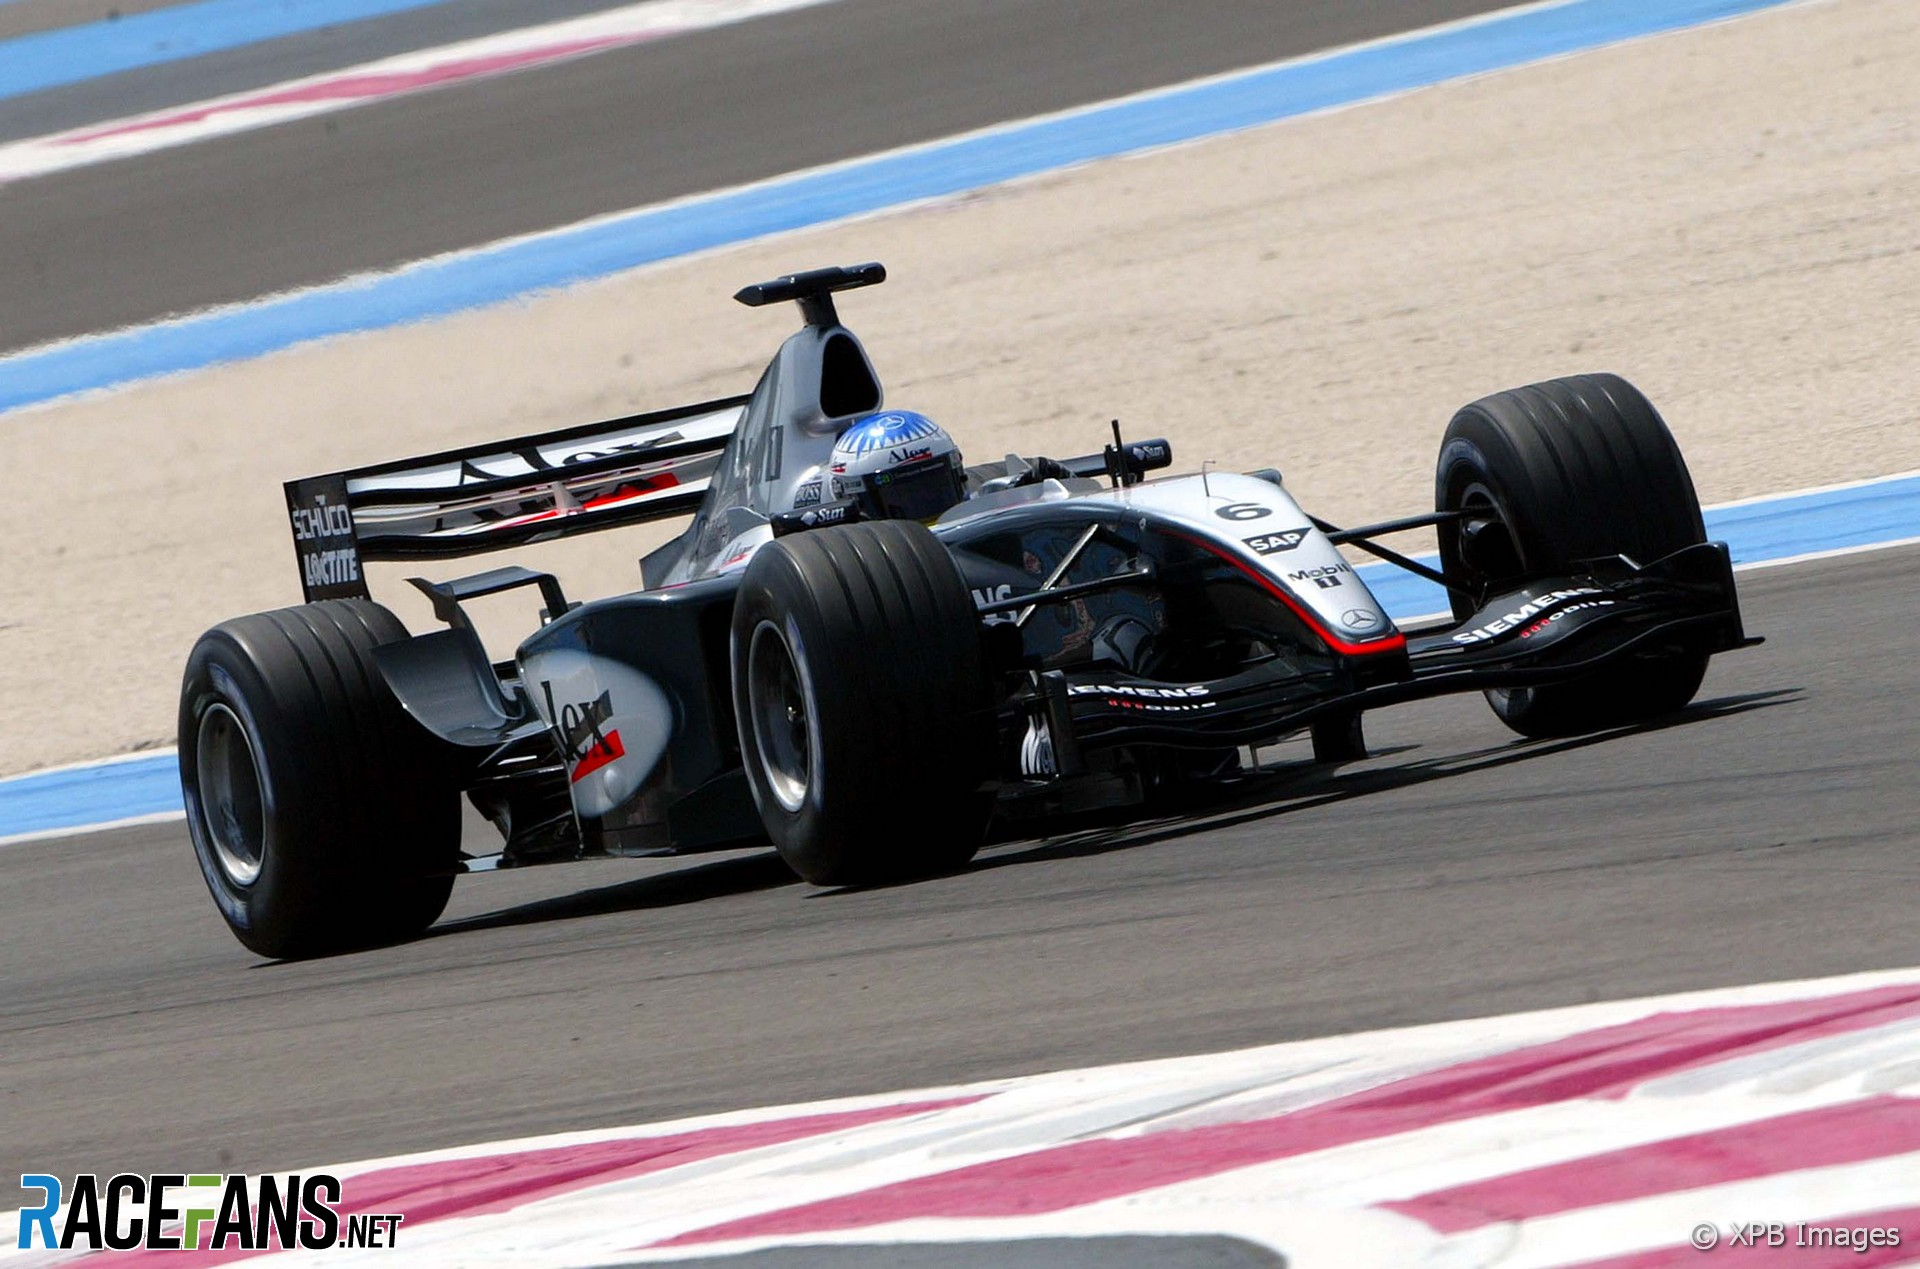 Alexander Wurz, McLaren, Paul Ricard, 2003